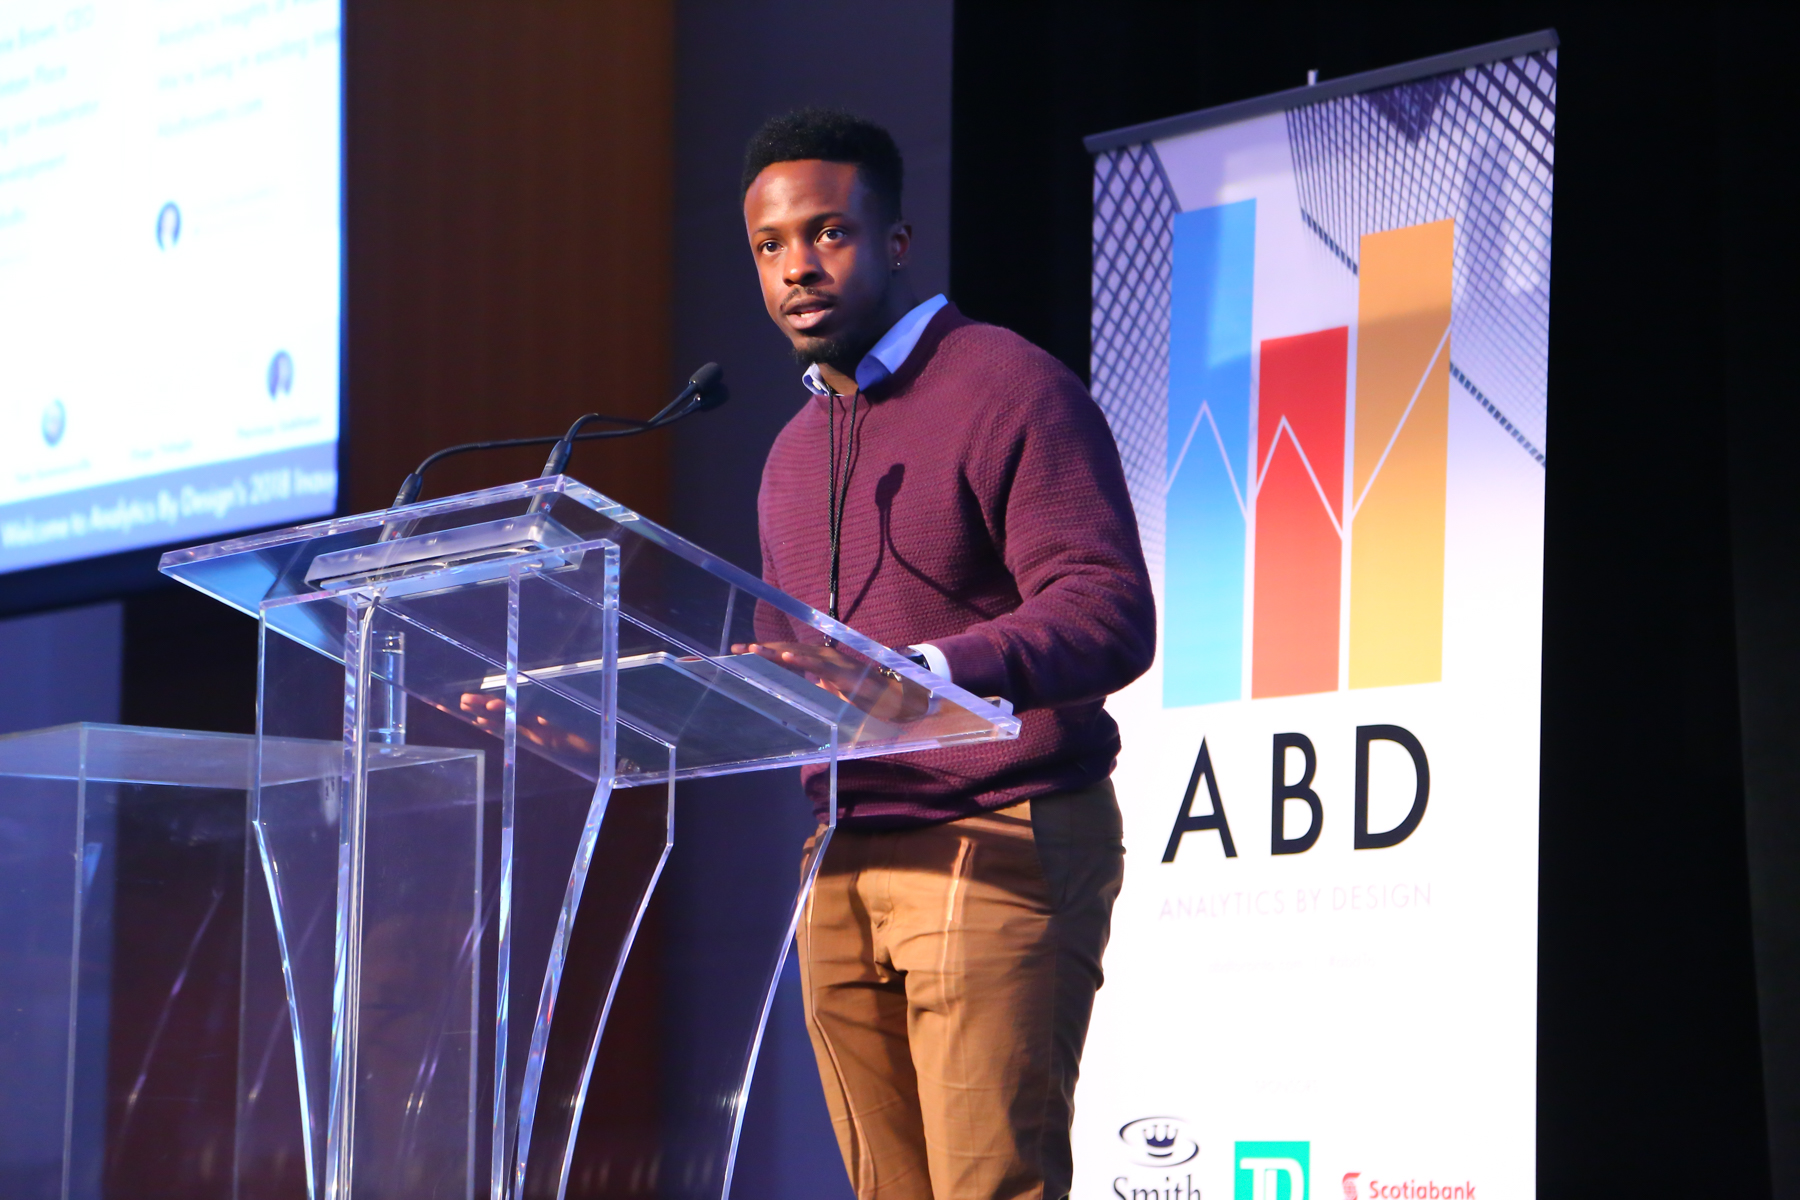 ABD_Conference_2018-072.jpg